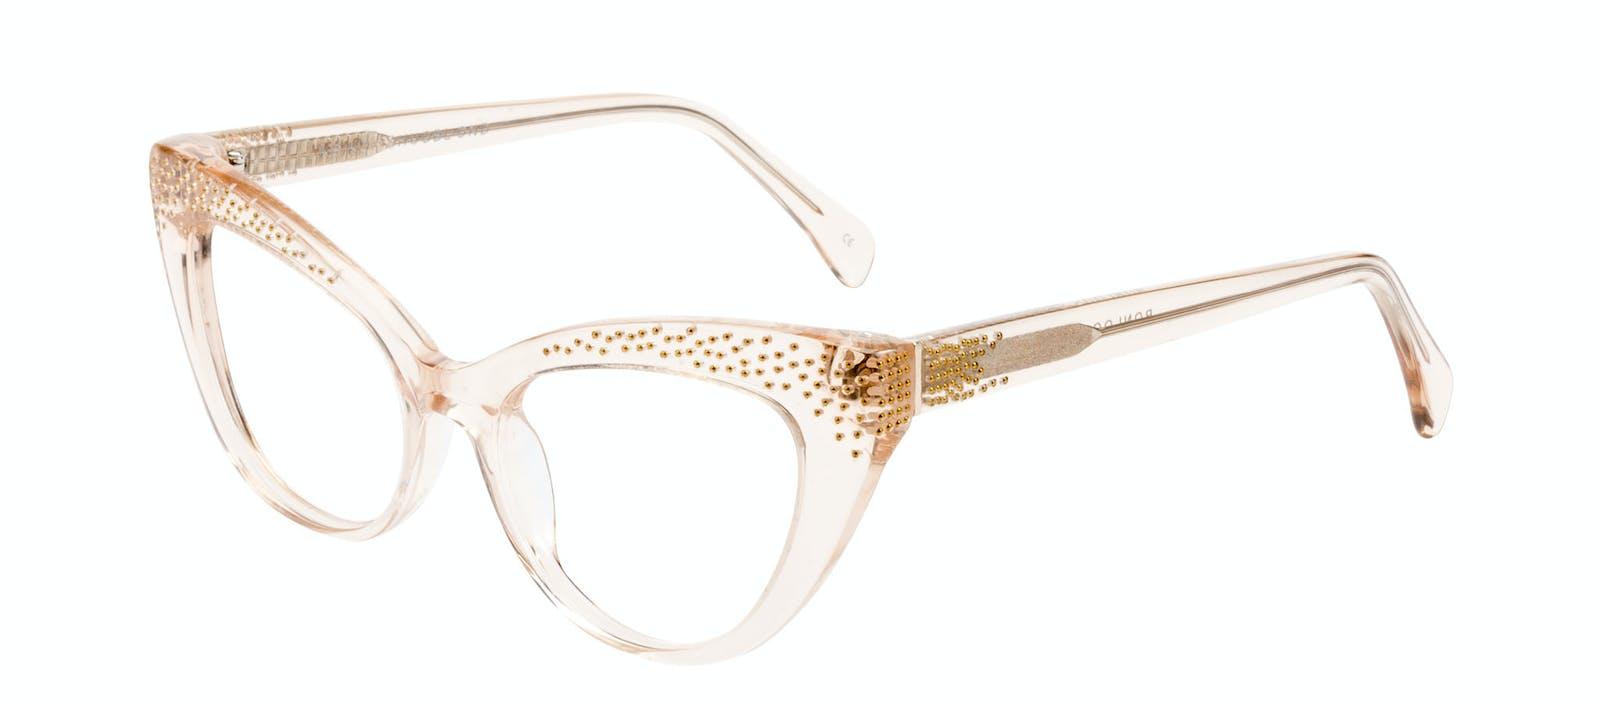 93f17c0d342 Affordable Fashion Glasses Cat Eye Daring Cateye Eyeglasses Women Keiko  Shug Blond Tilt